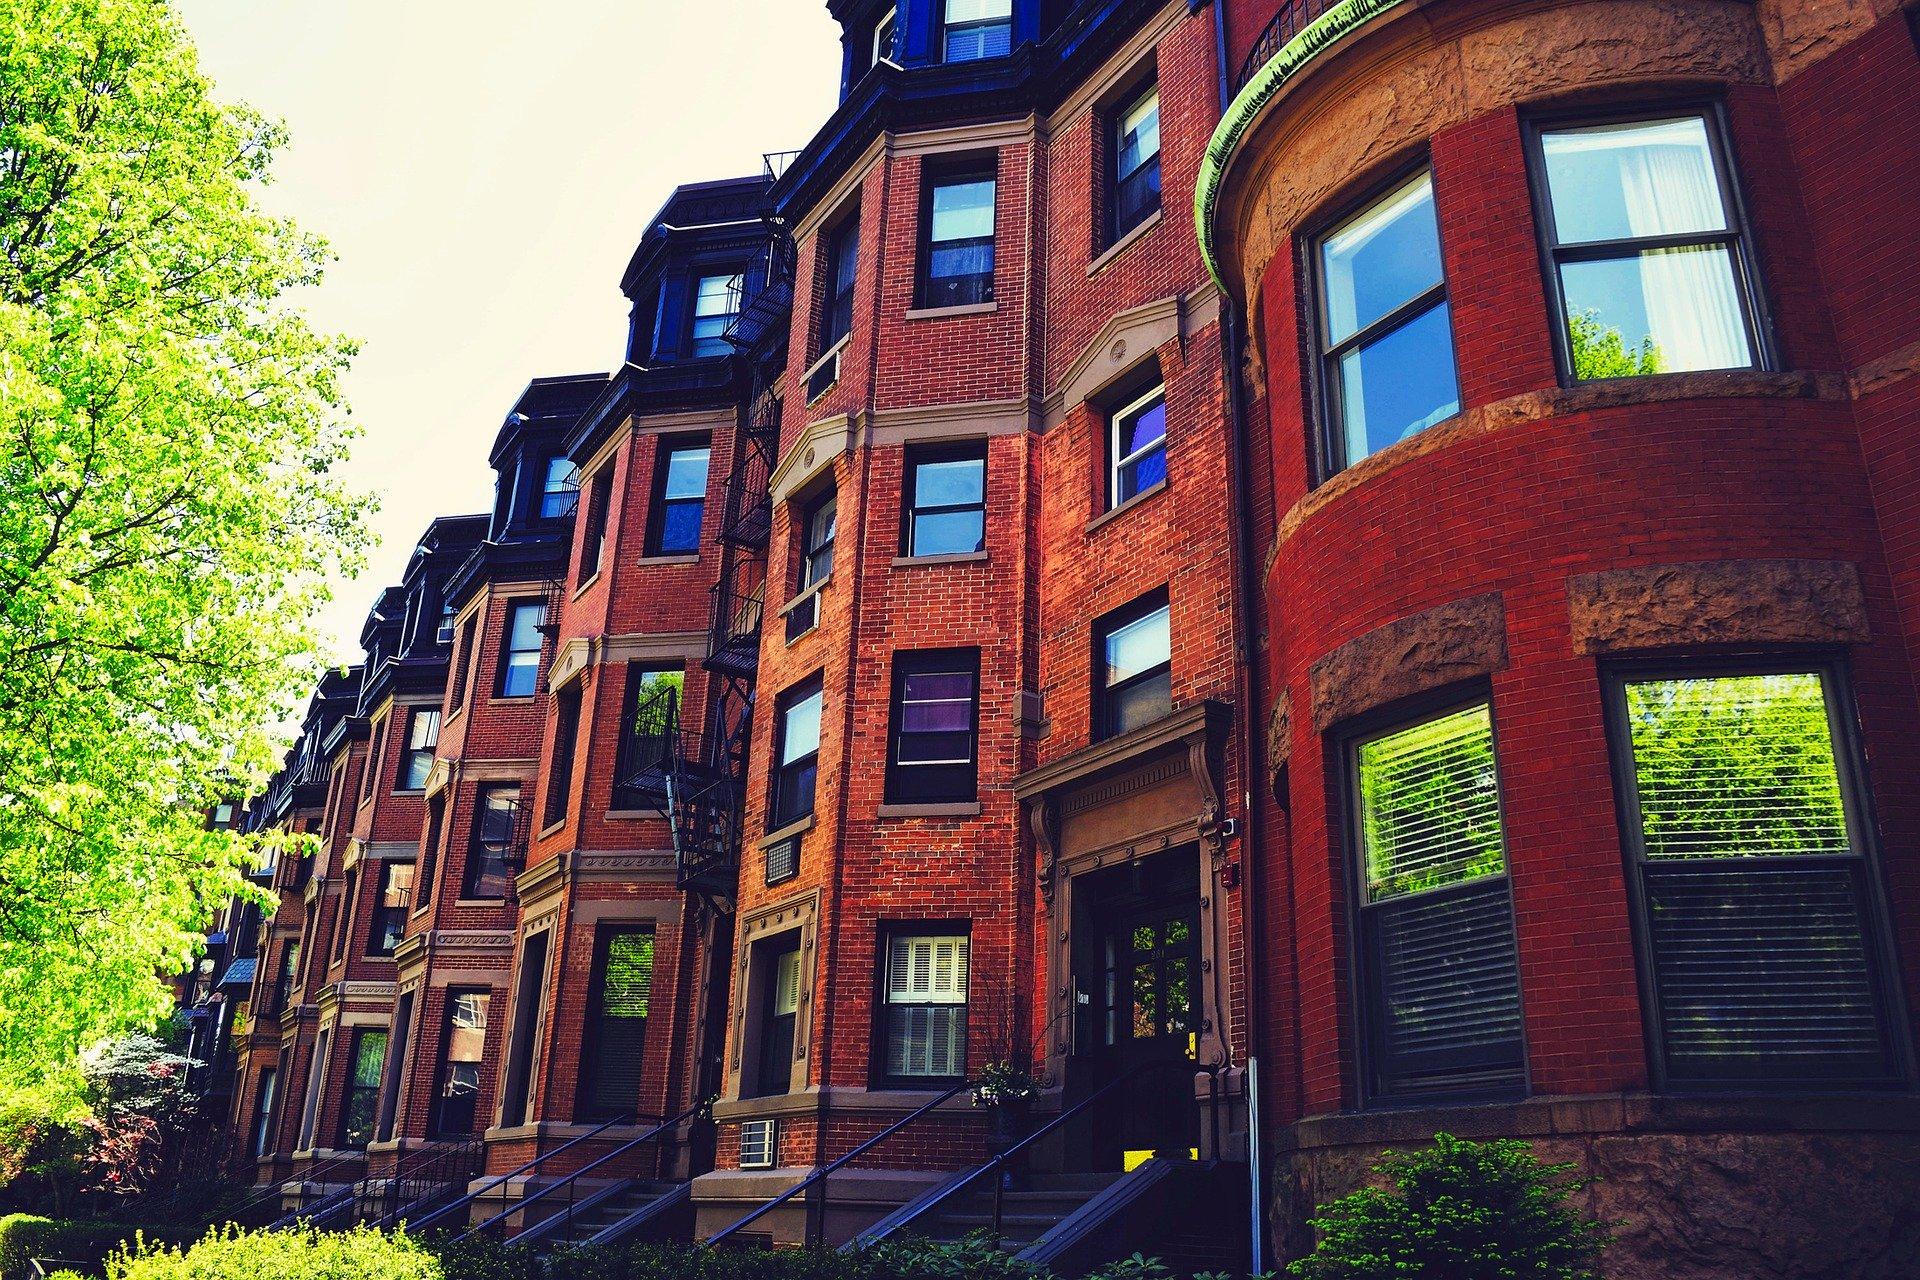 brownstone houses in Boston